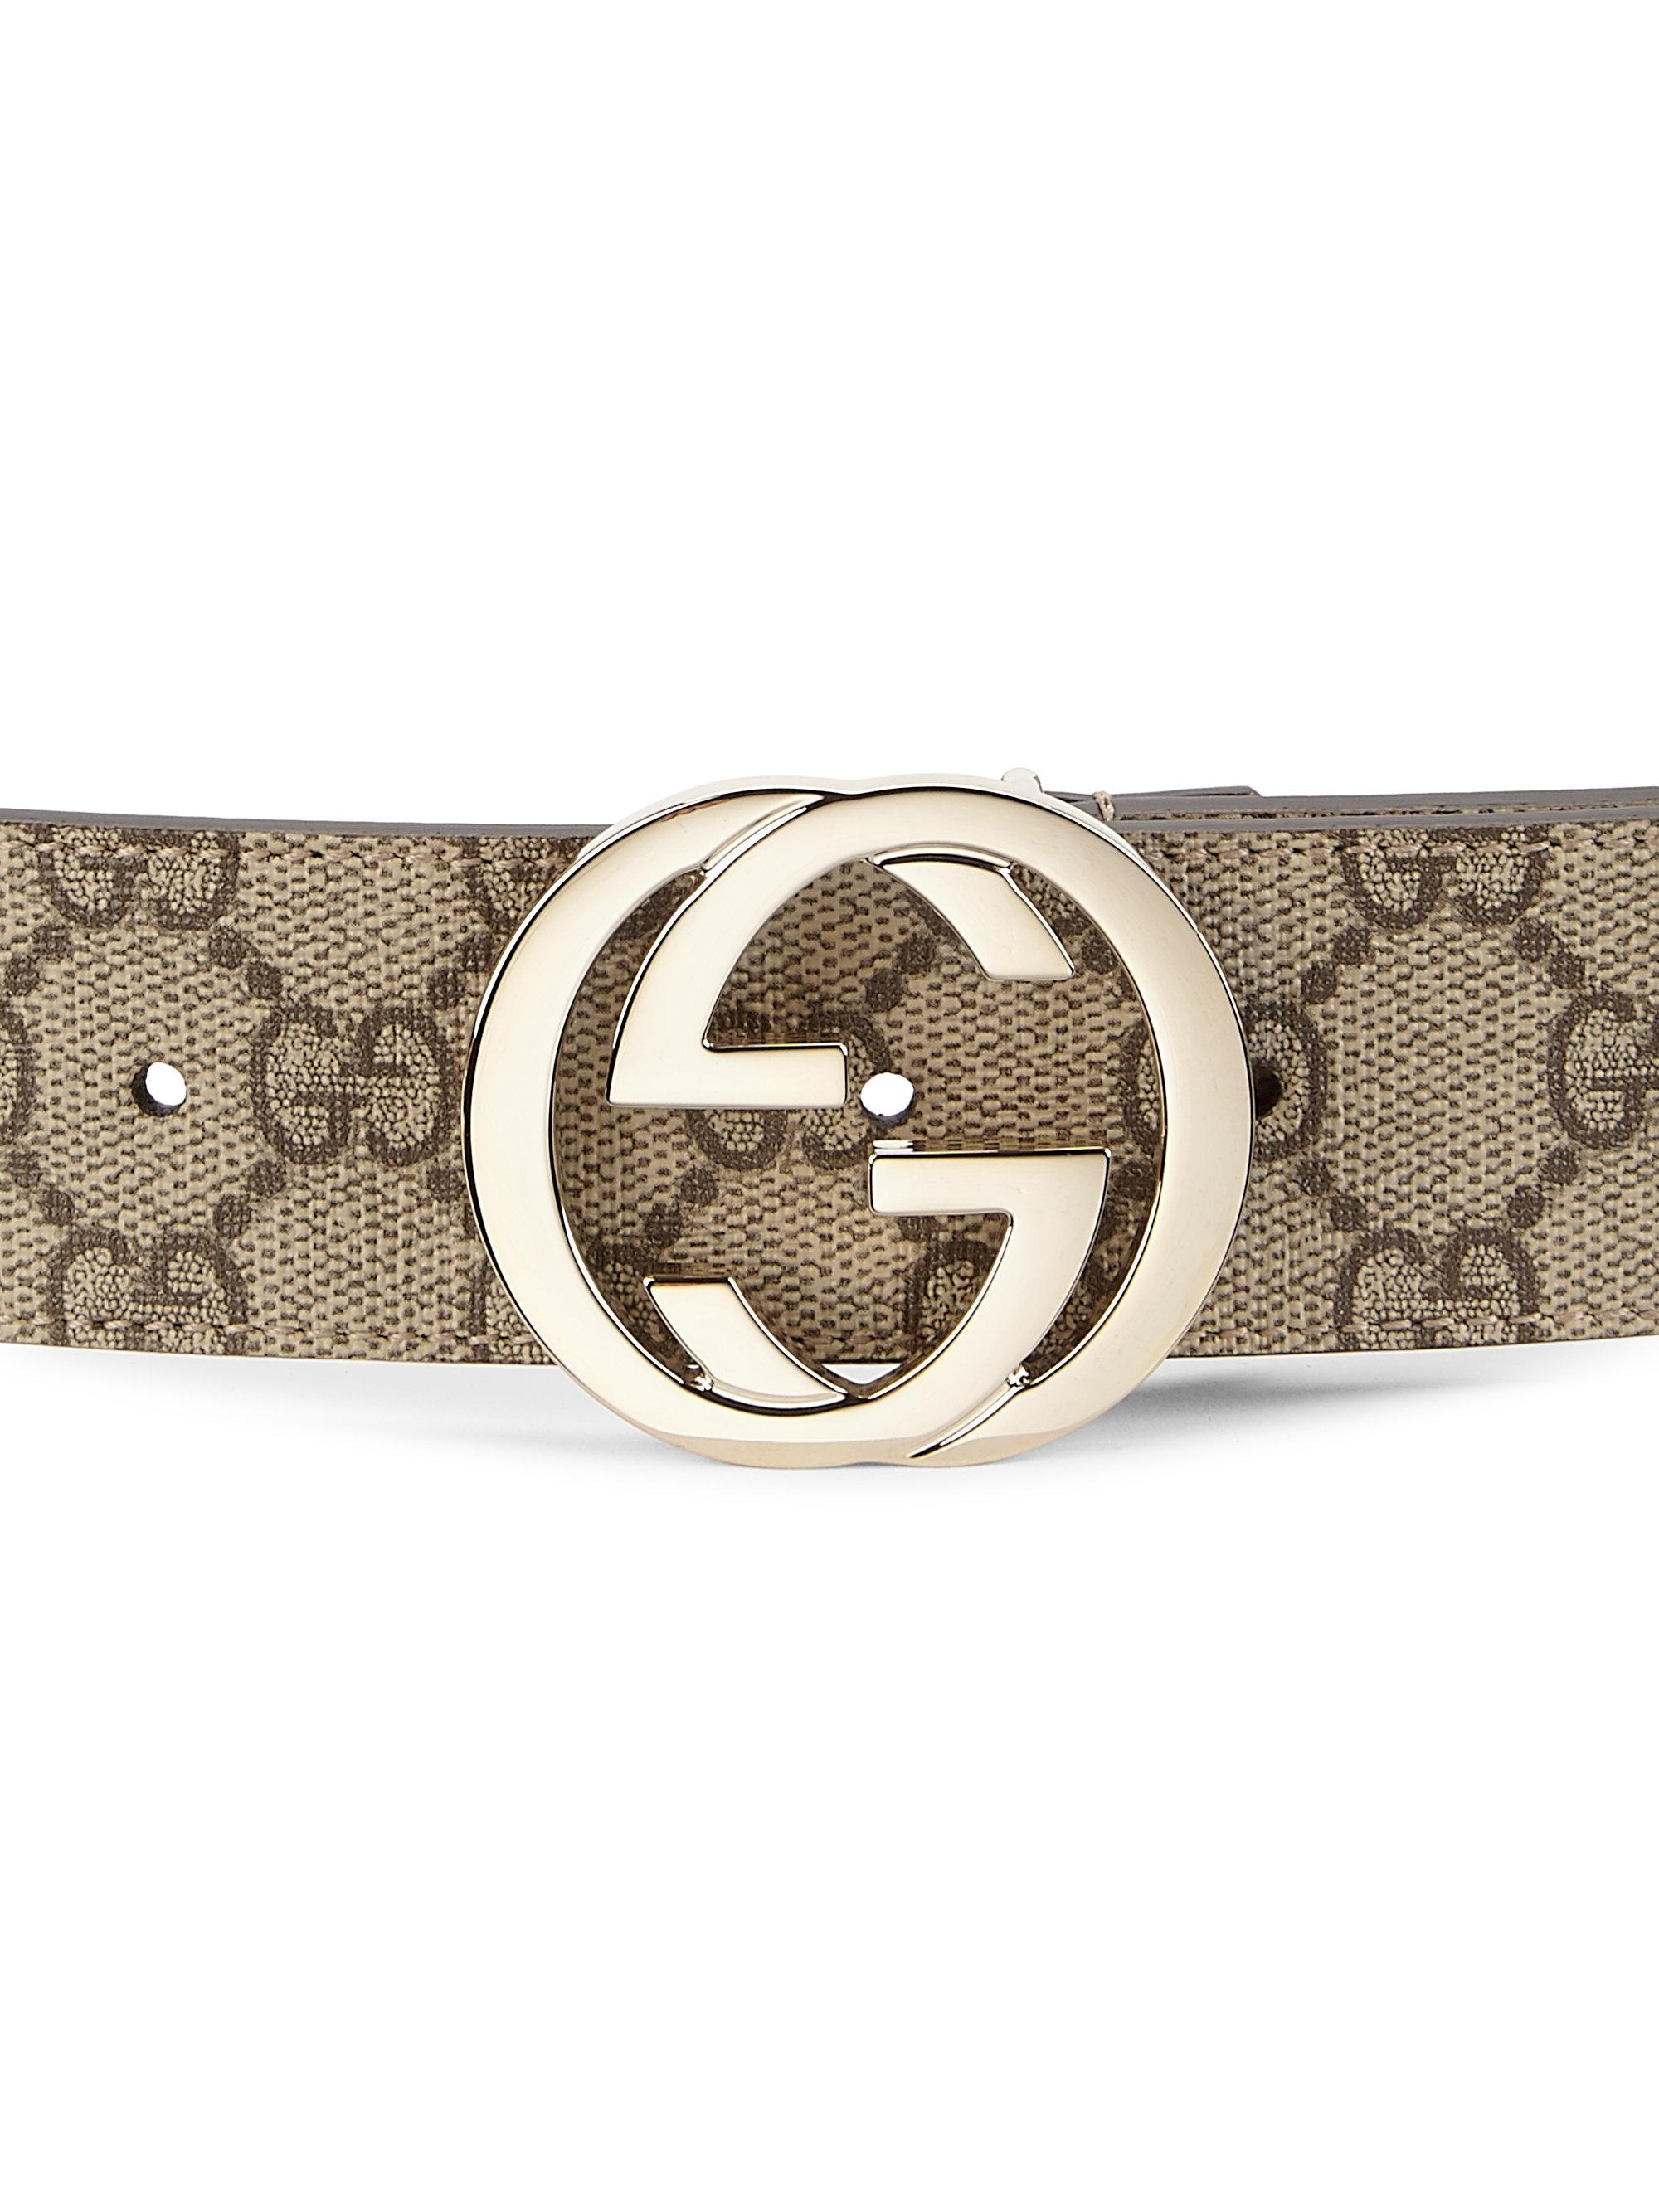 0fbcbf407a48f Gucci Interlocking G Logo Belt in Natural - Lyst